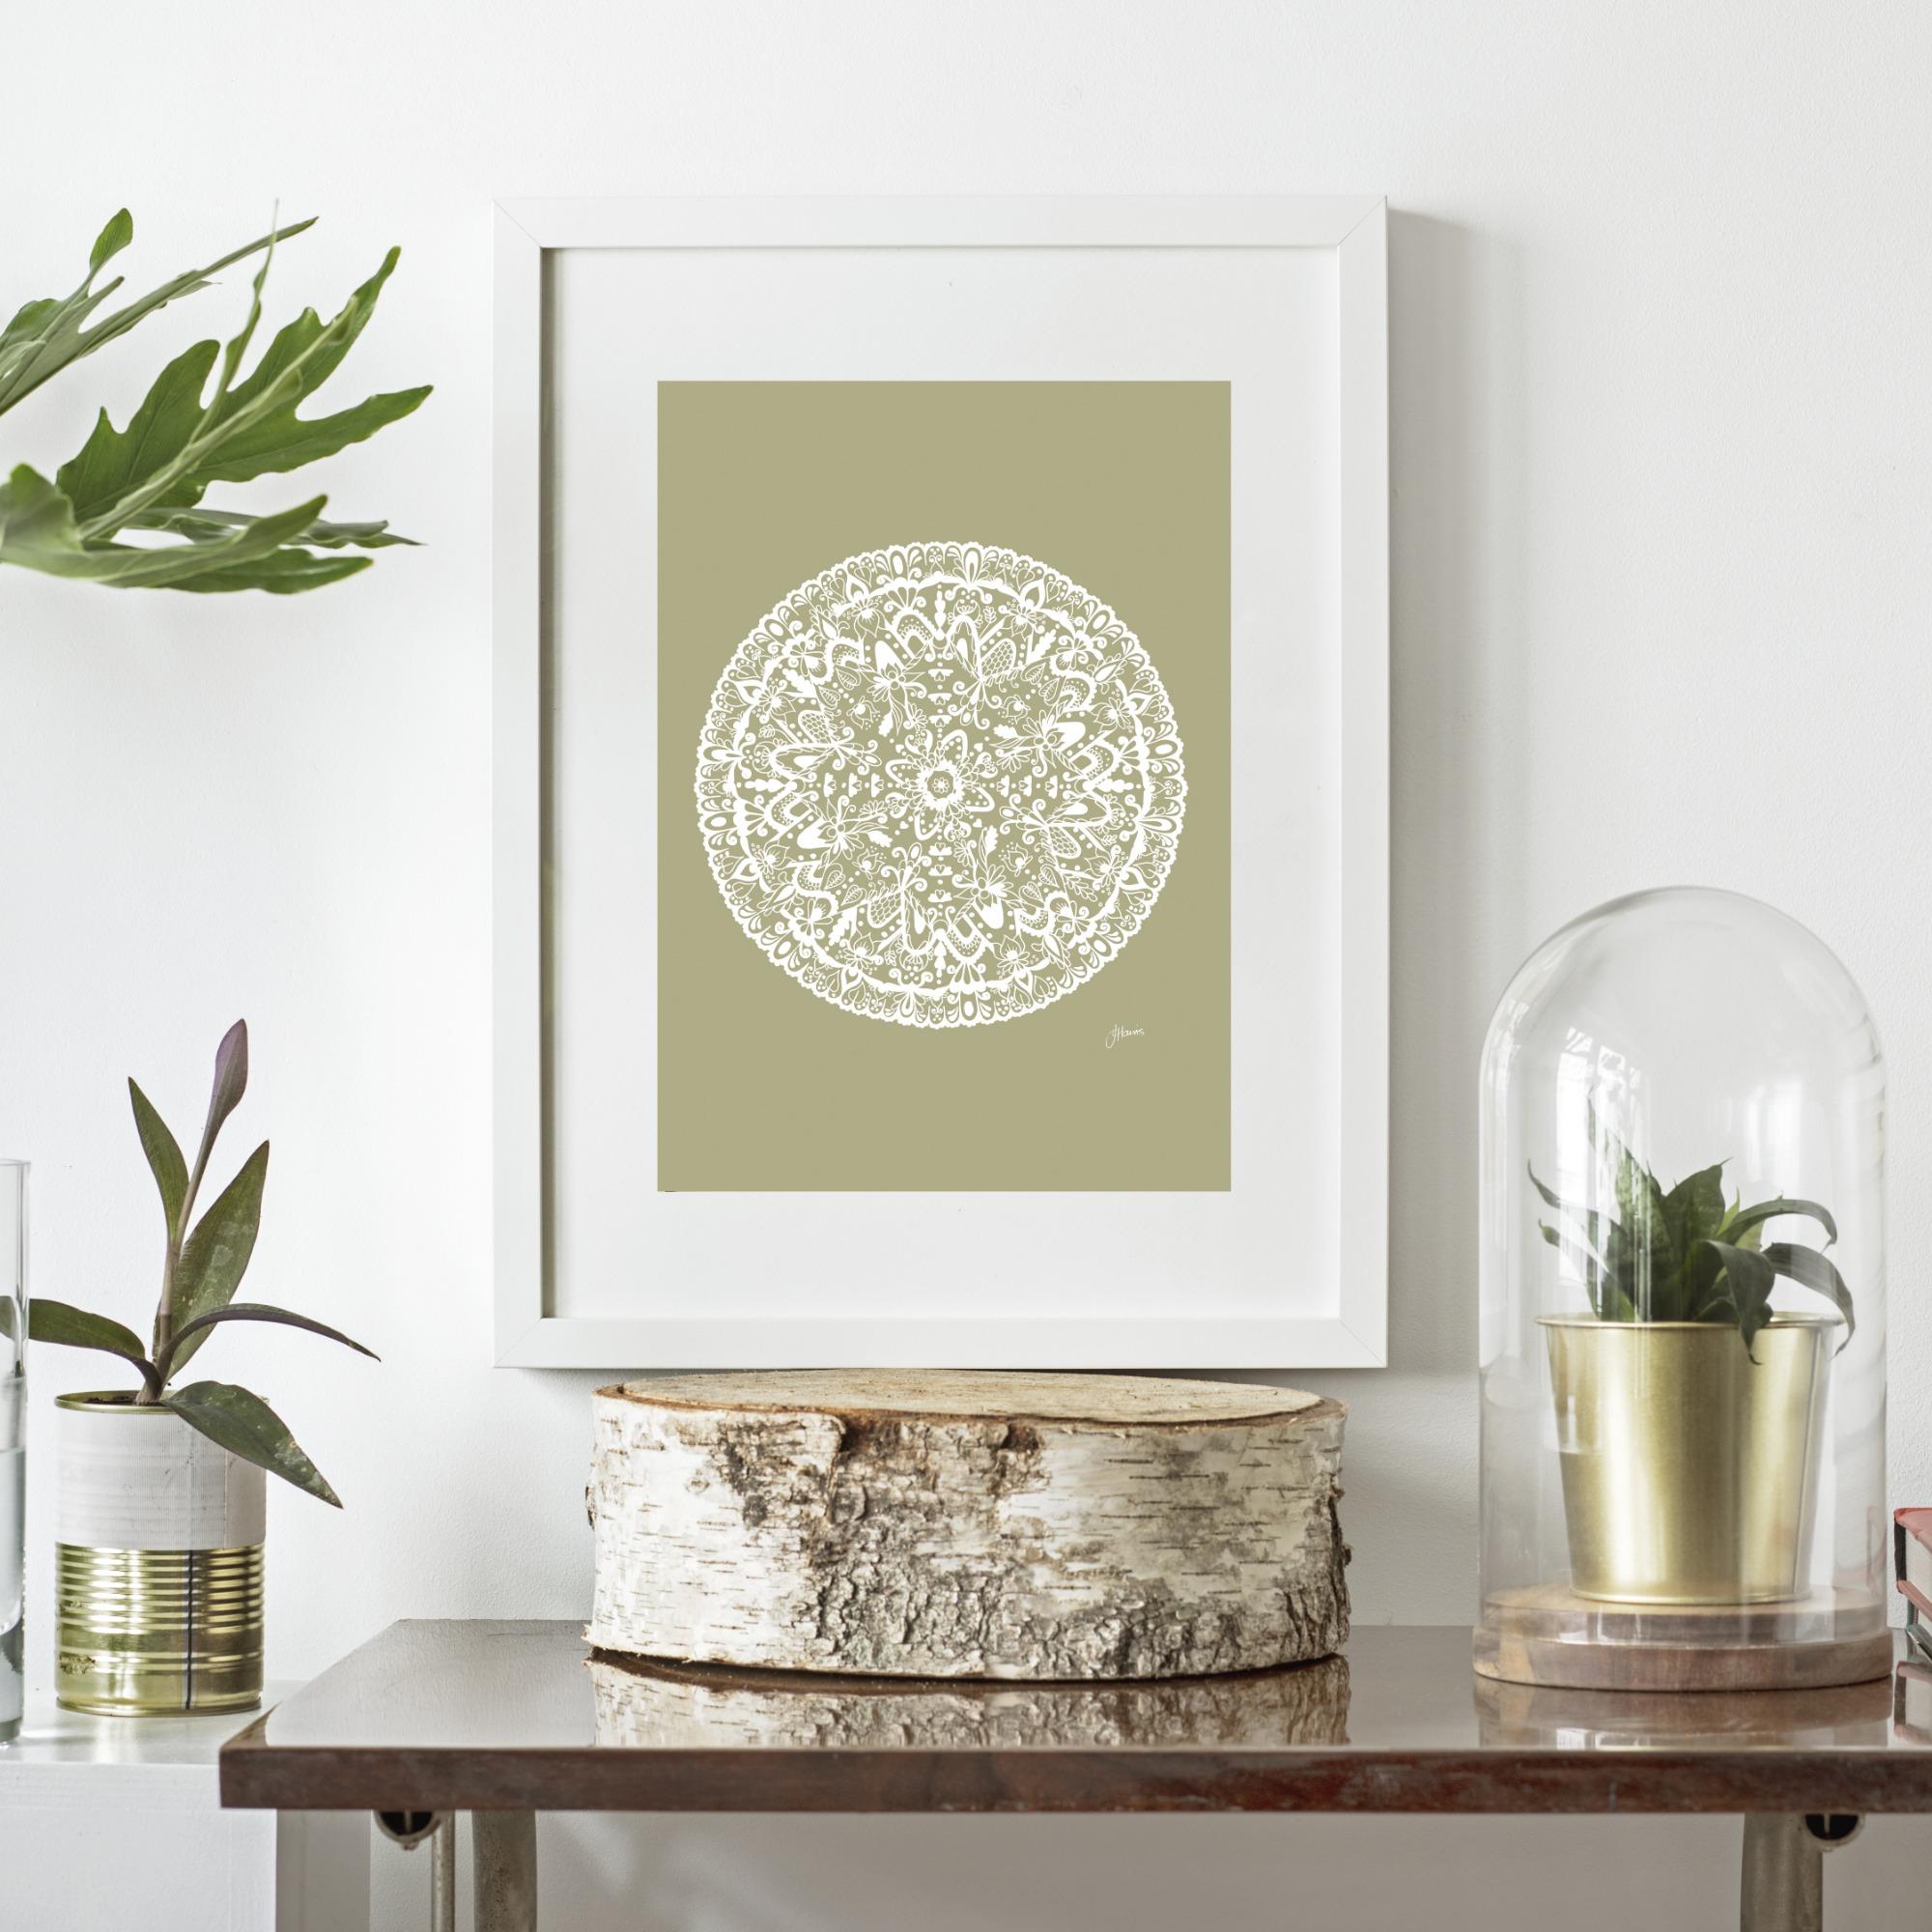 Sahara Decor Mandala in Solid Sage